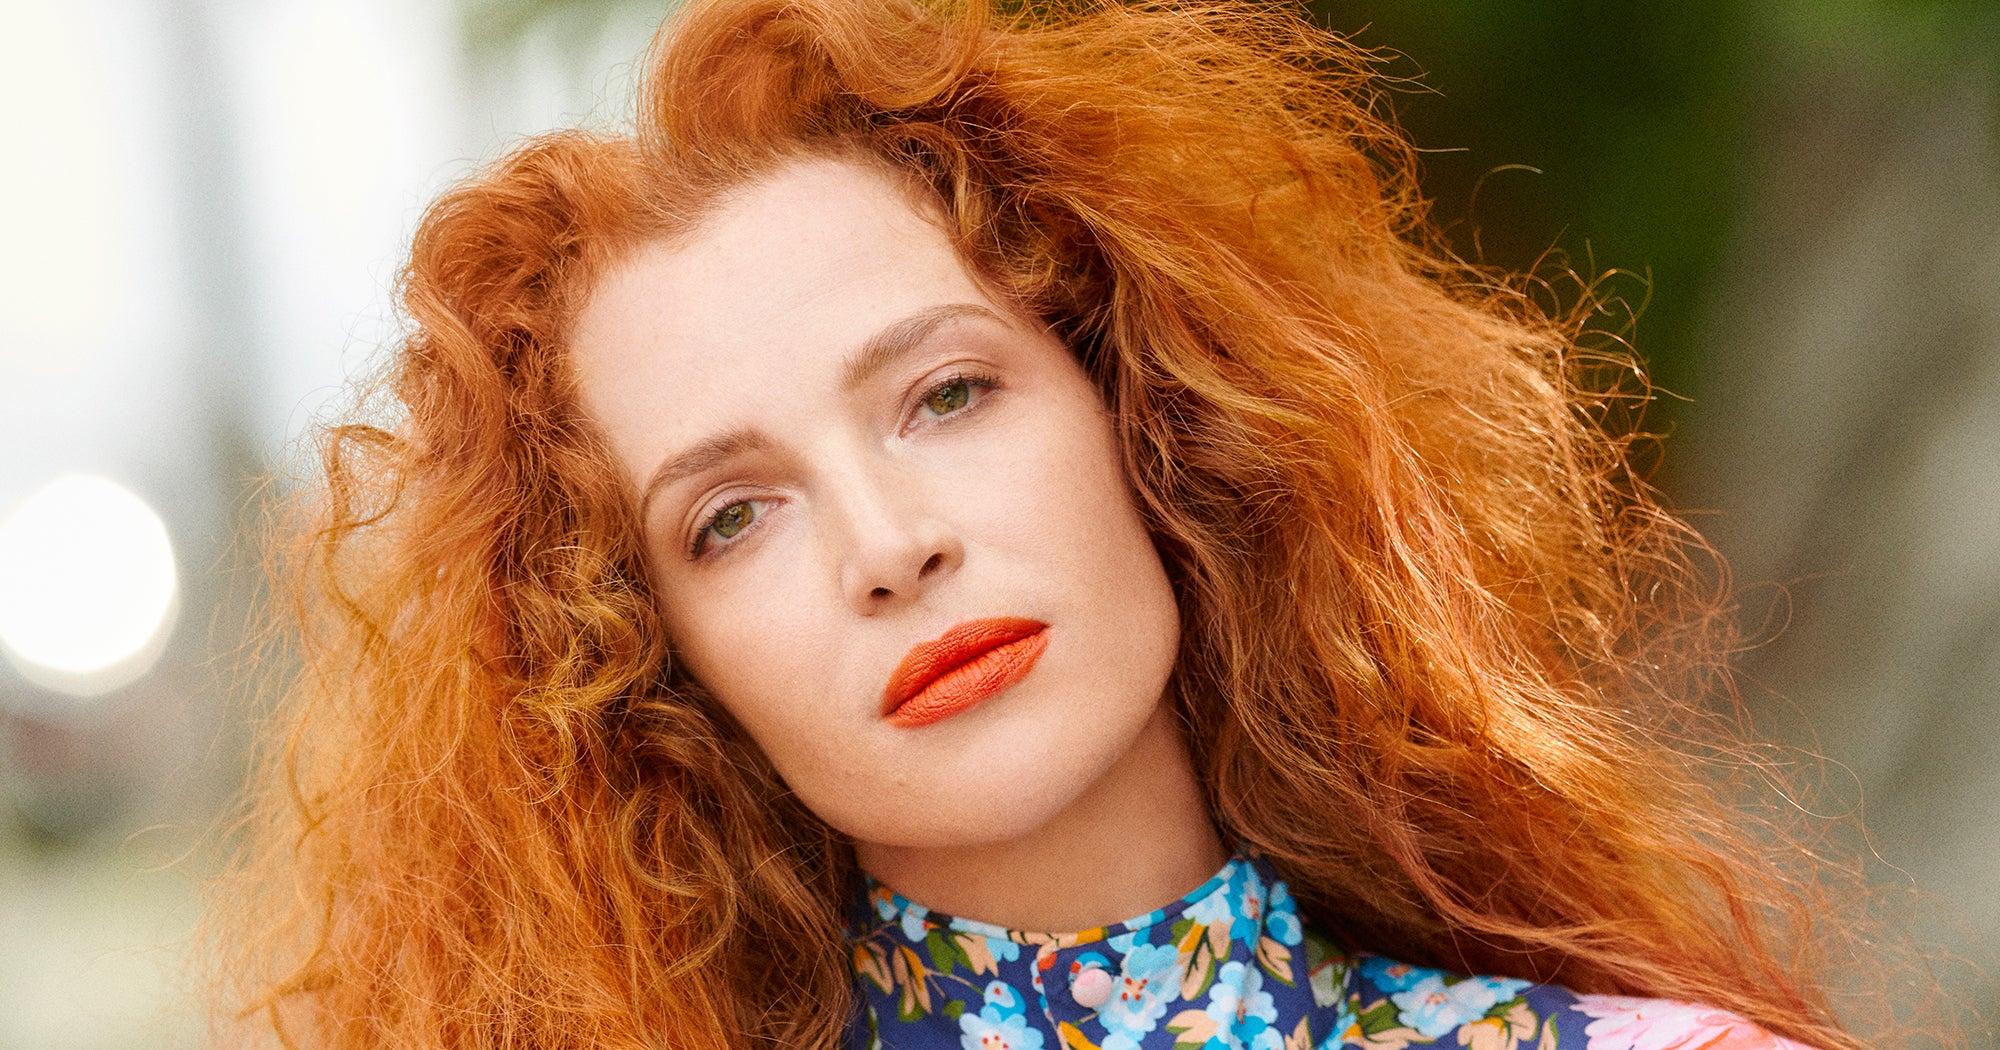 The Laura Ashley x Batsheva Collection Is Peak Cottagecore